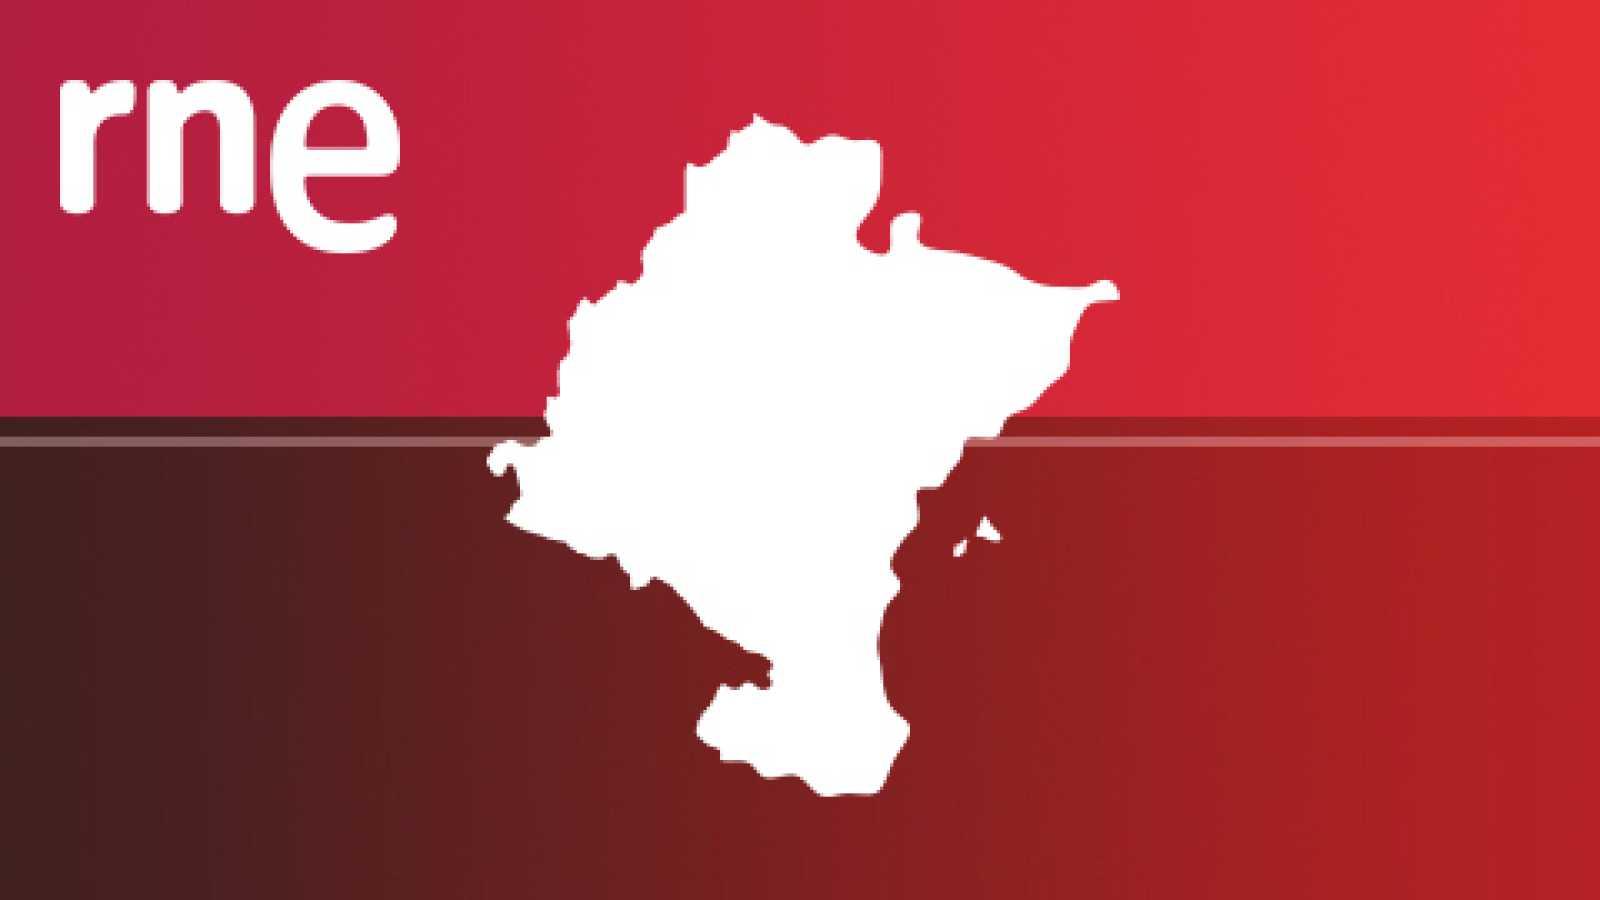 entrevista-primeros-auxilios- 1339121 2019-09-15t08-08-36000